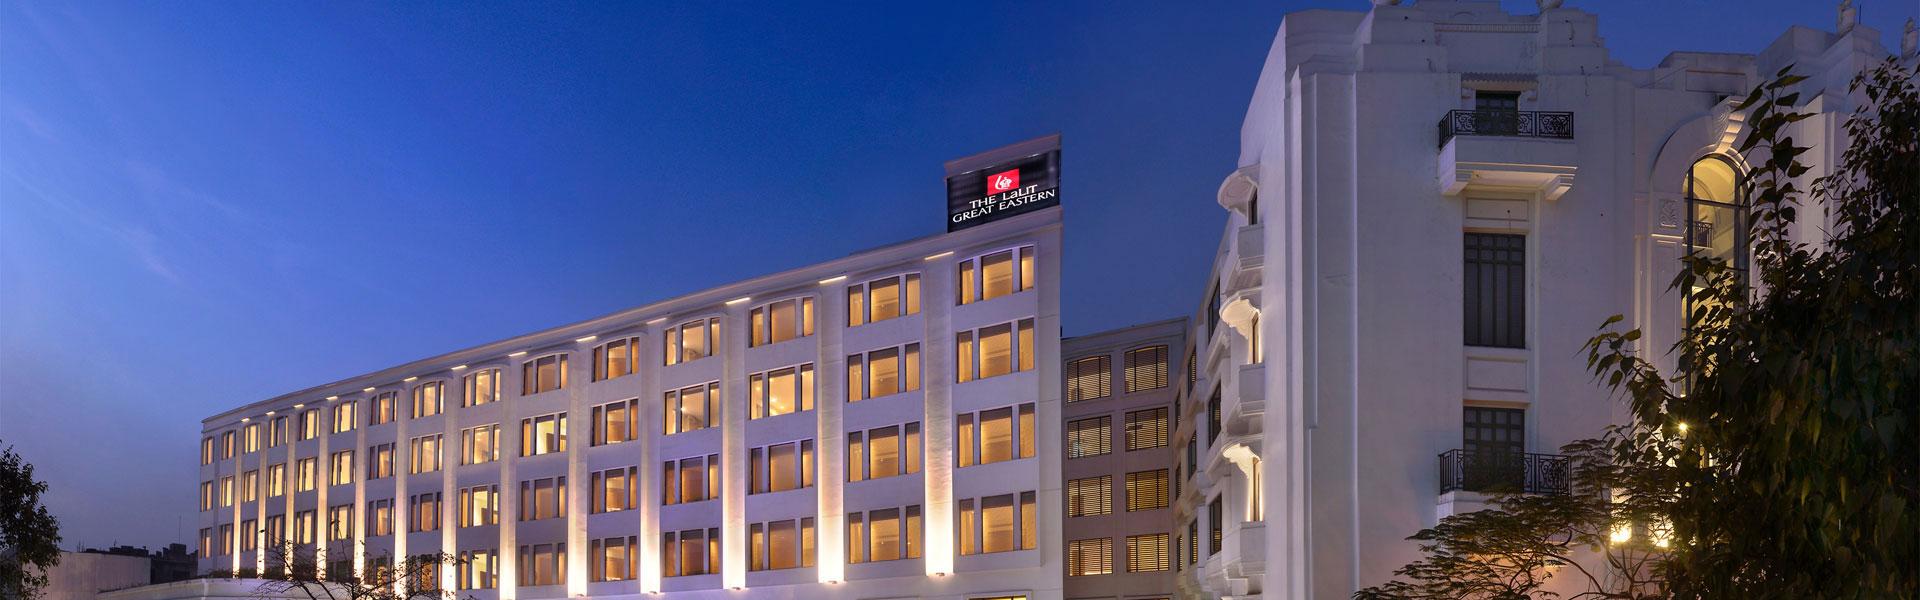 The Lalit Great Eastern Kolkata Hotel Or Destination